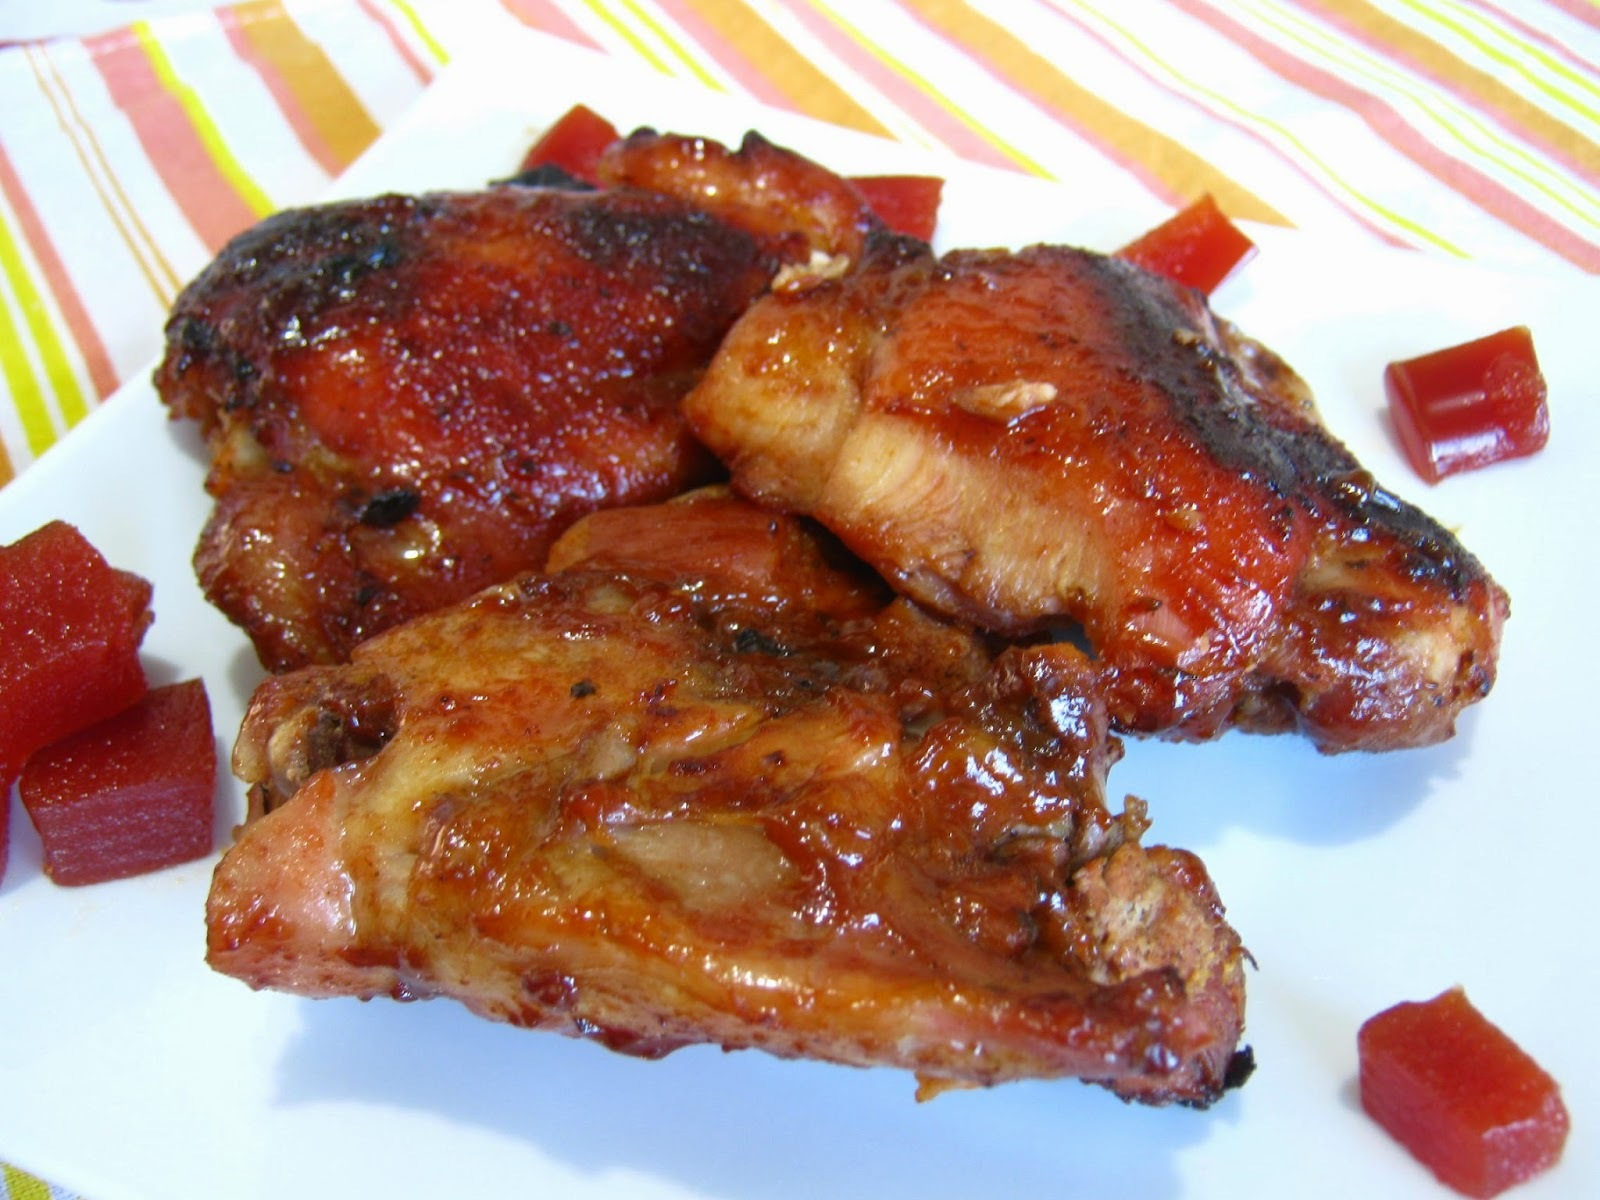 Sobrecoxa de frango com barbecue e goiabada